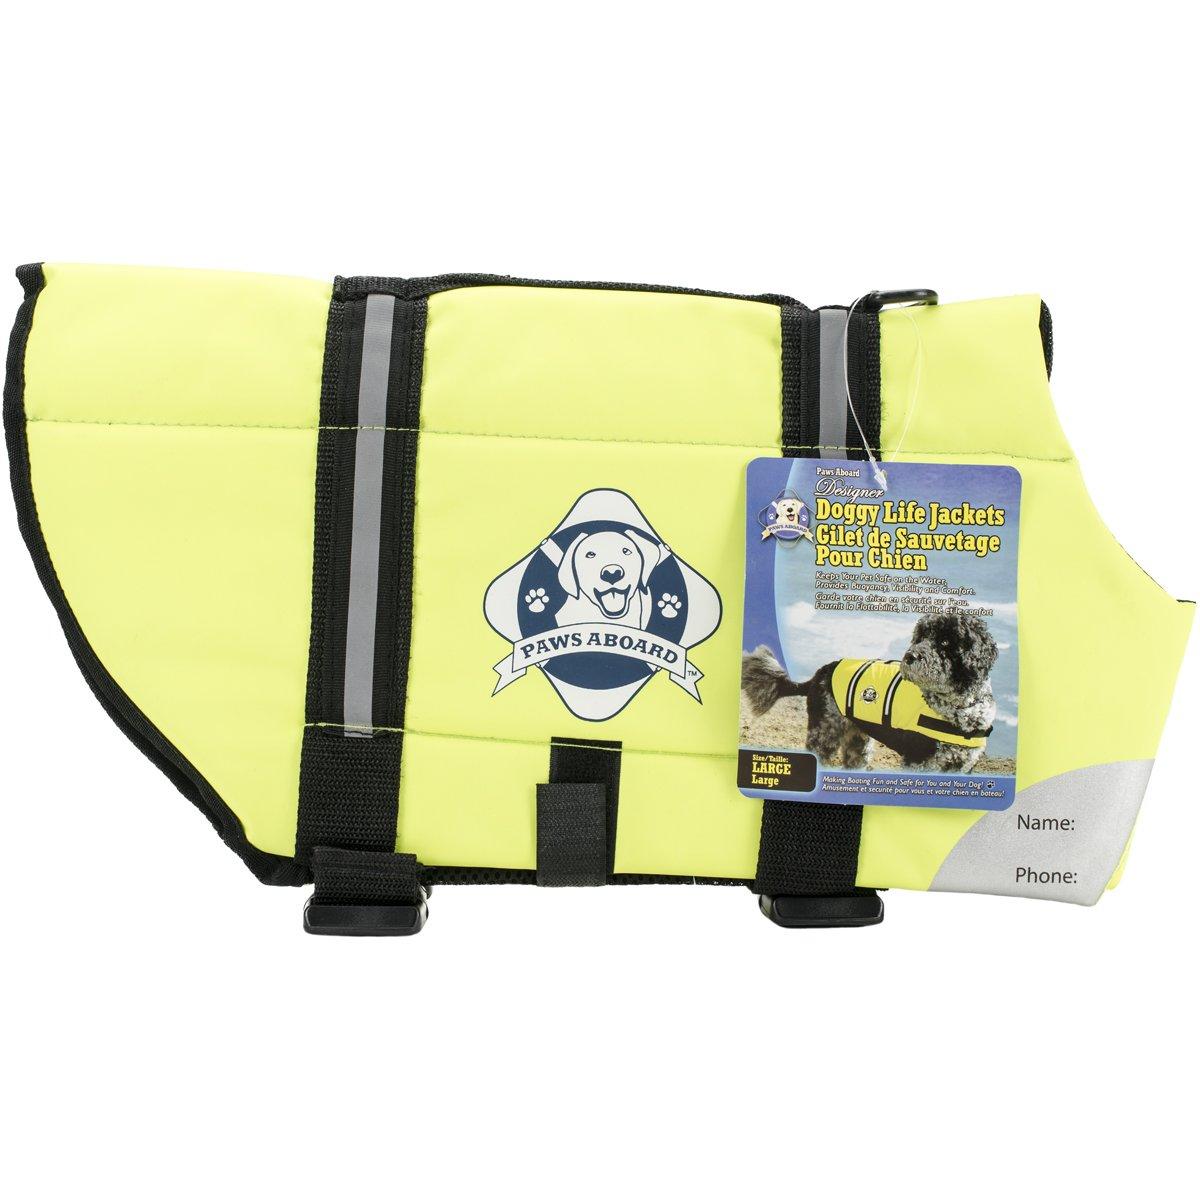 Paws Aboard 1500 Designer Doggy Life Jacket, Neon Yellow, Large